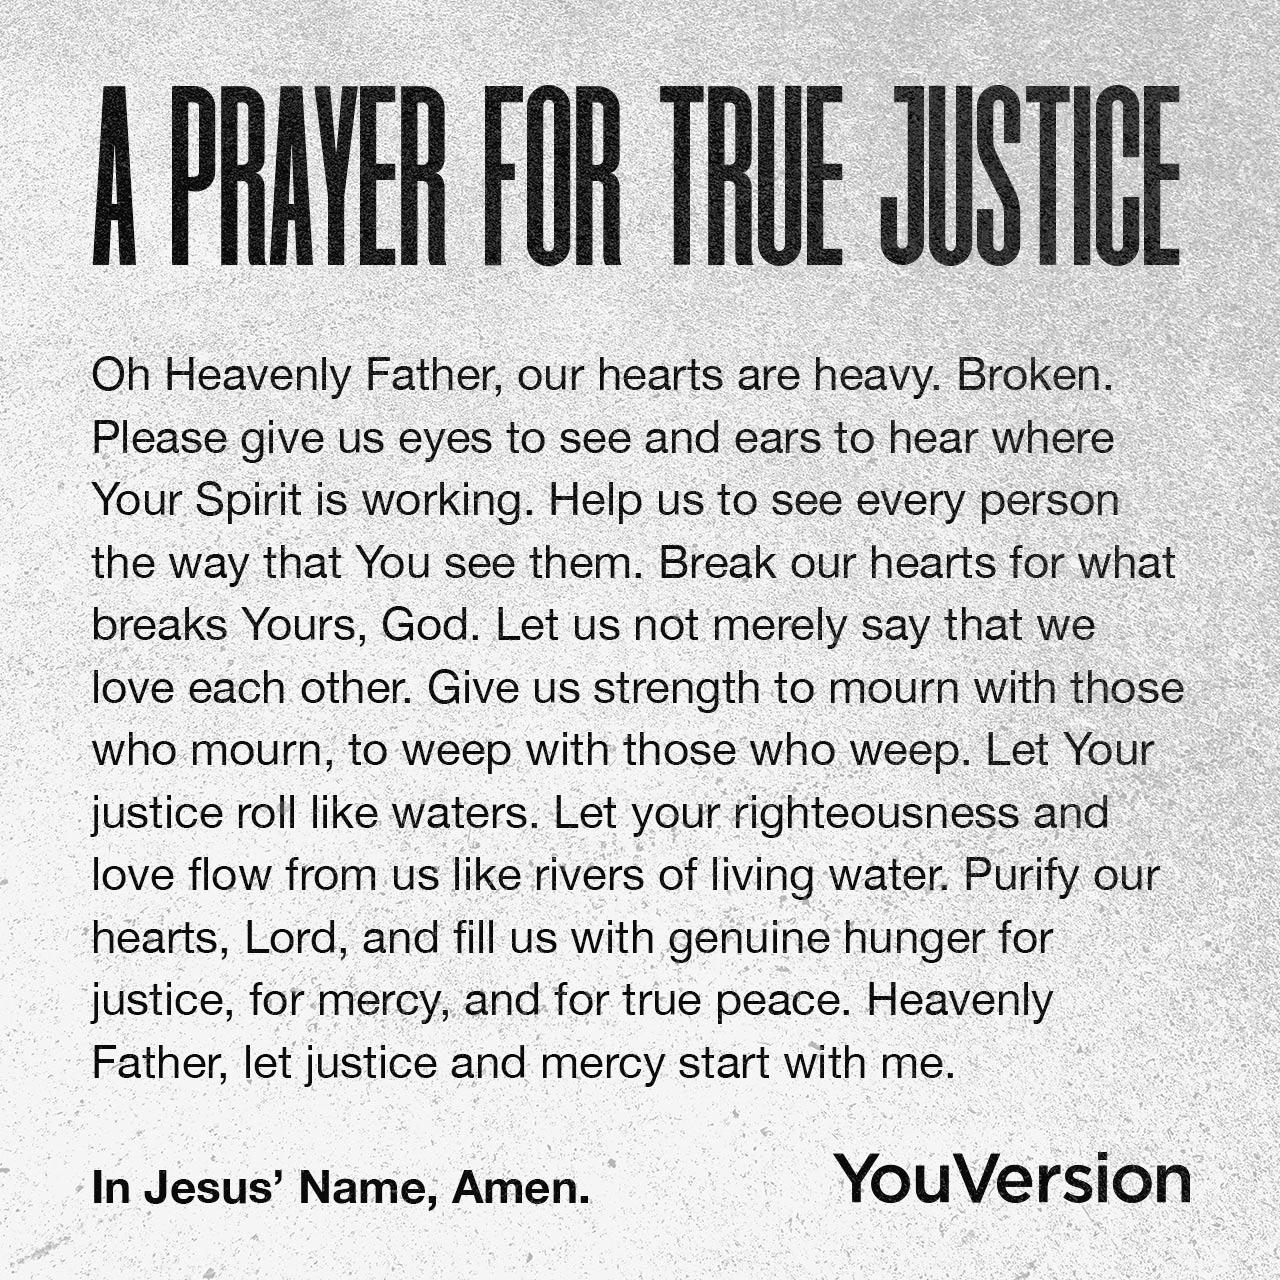 prayer-for-true-justice-share